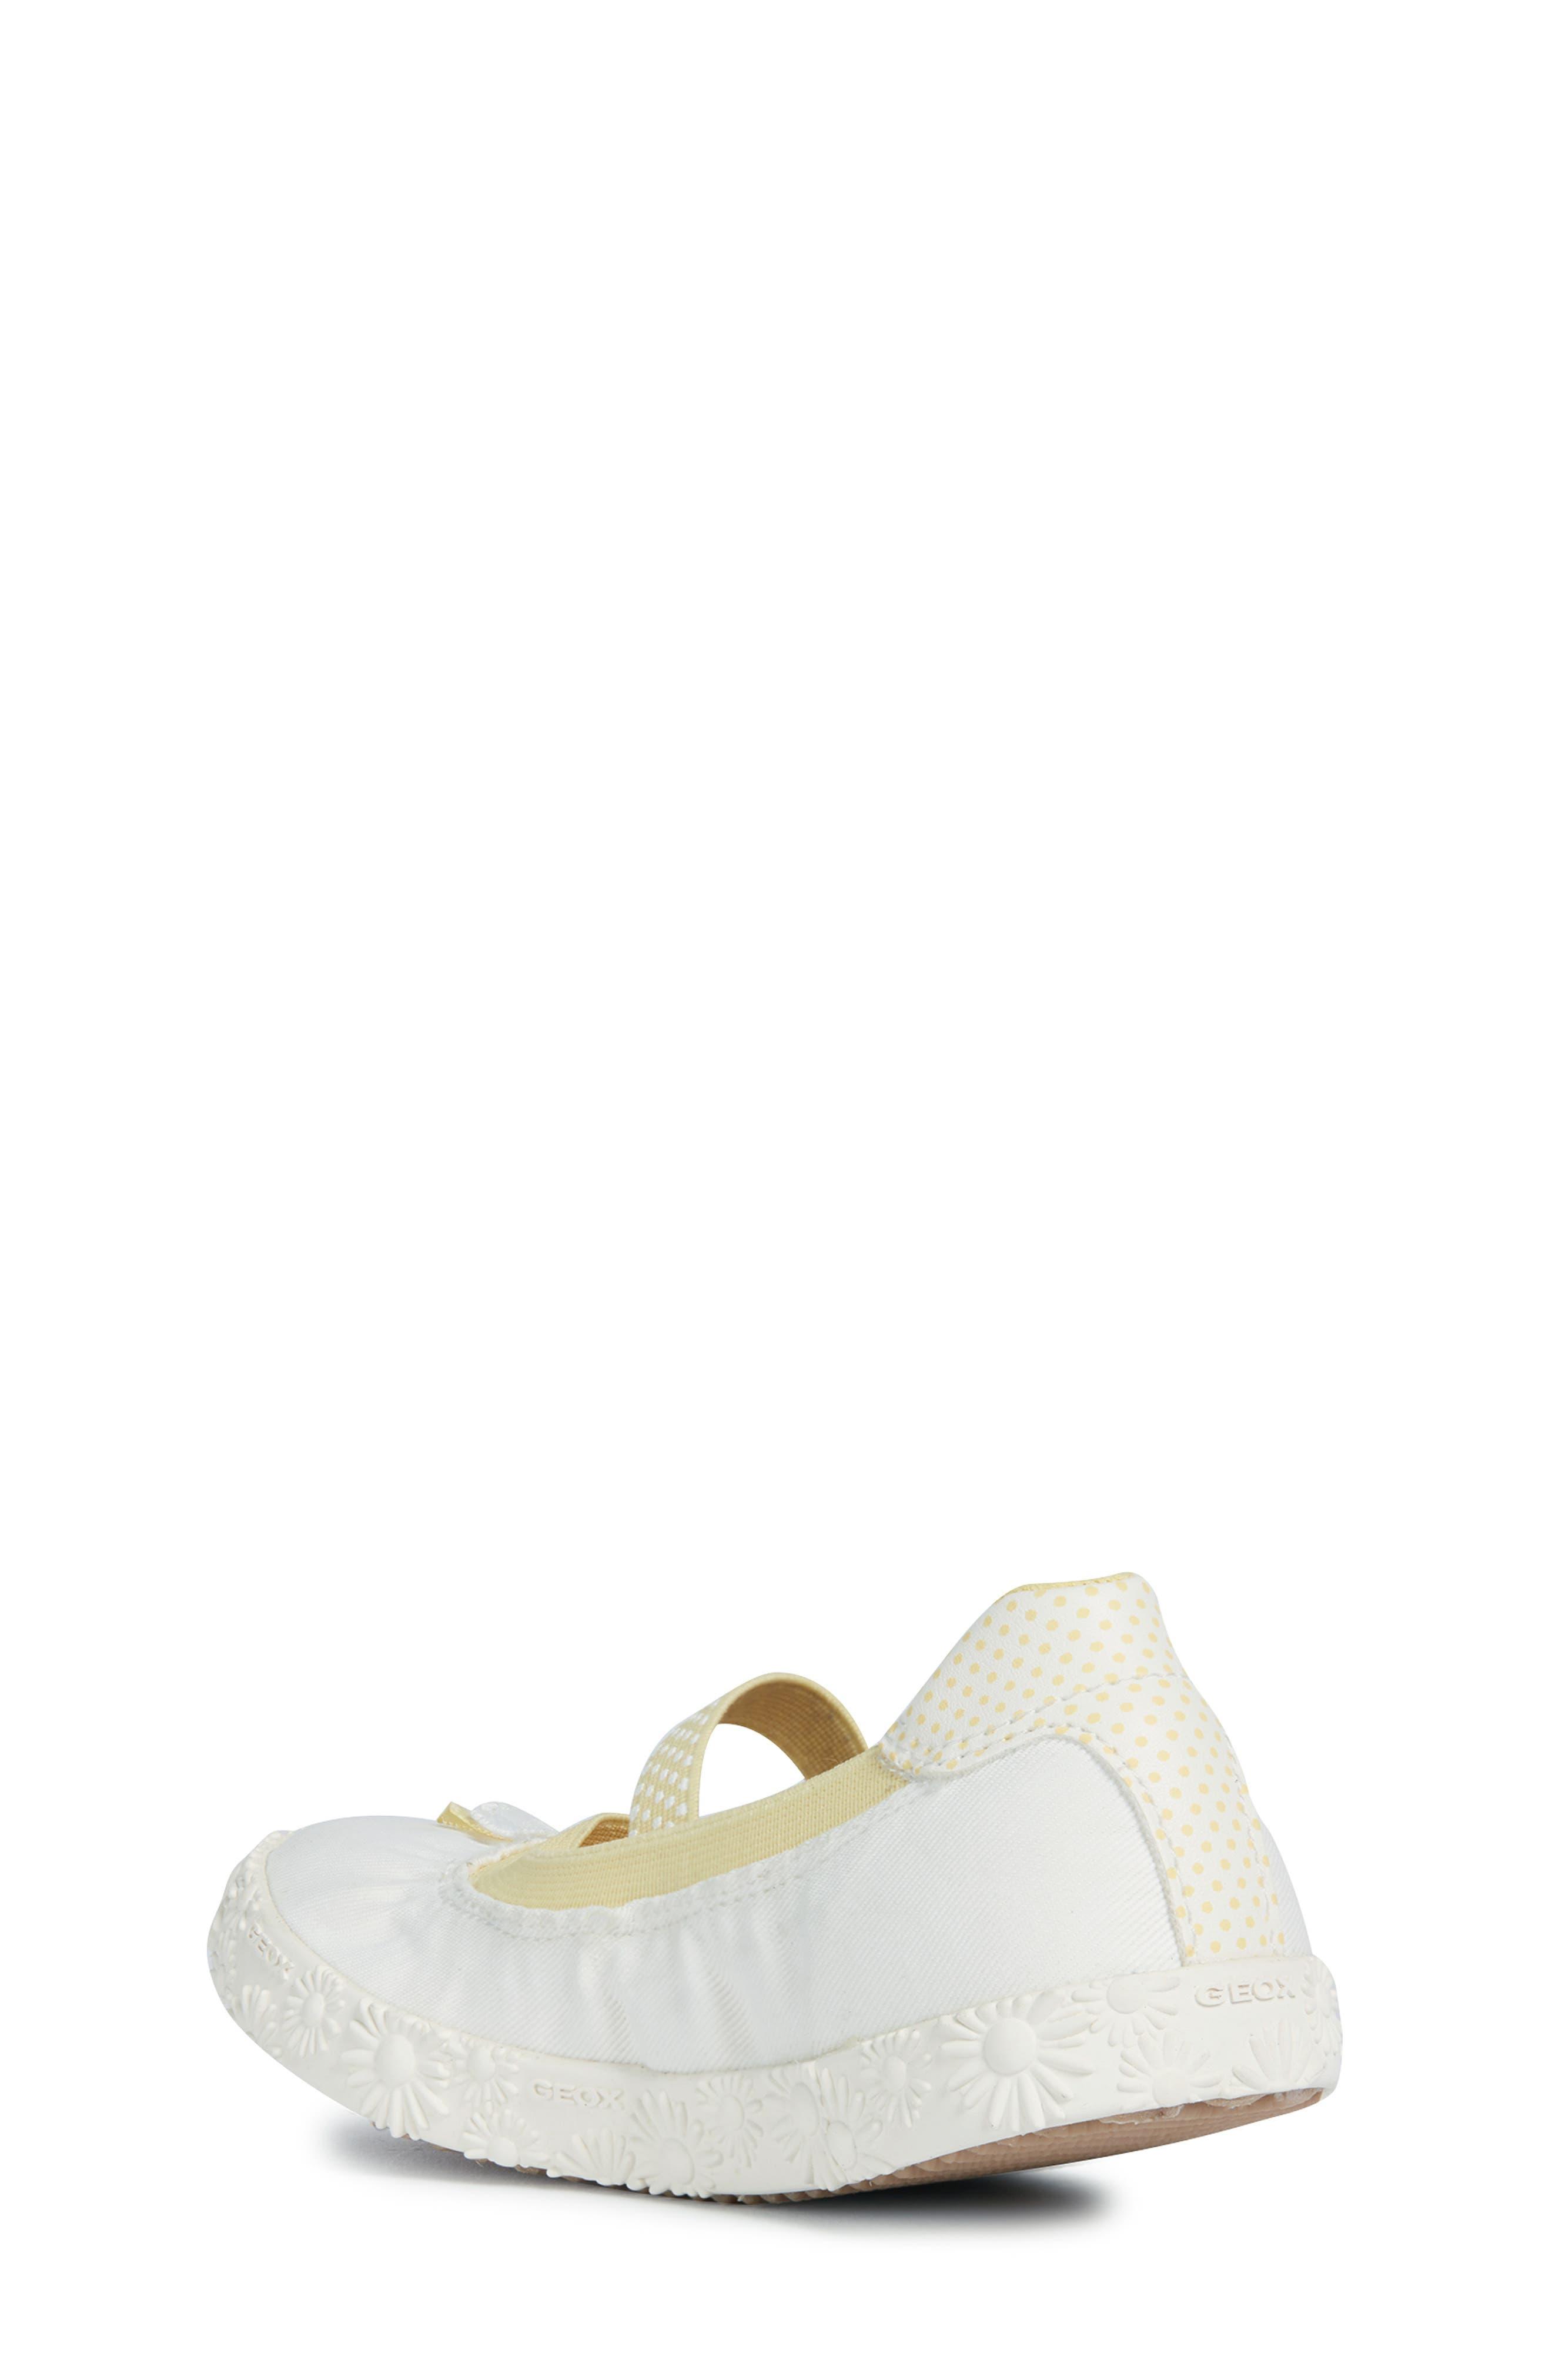 GEOX, Kilwi Daisy Mary Jane Sneaker, Alternate thumbnail 2, color, WHITE